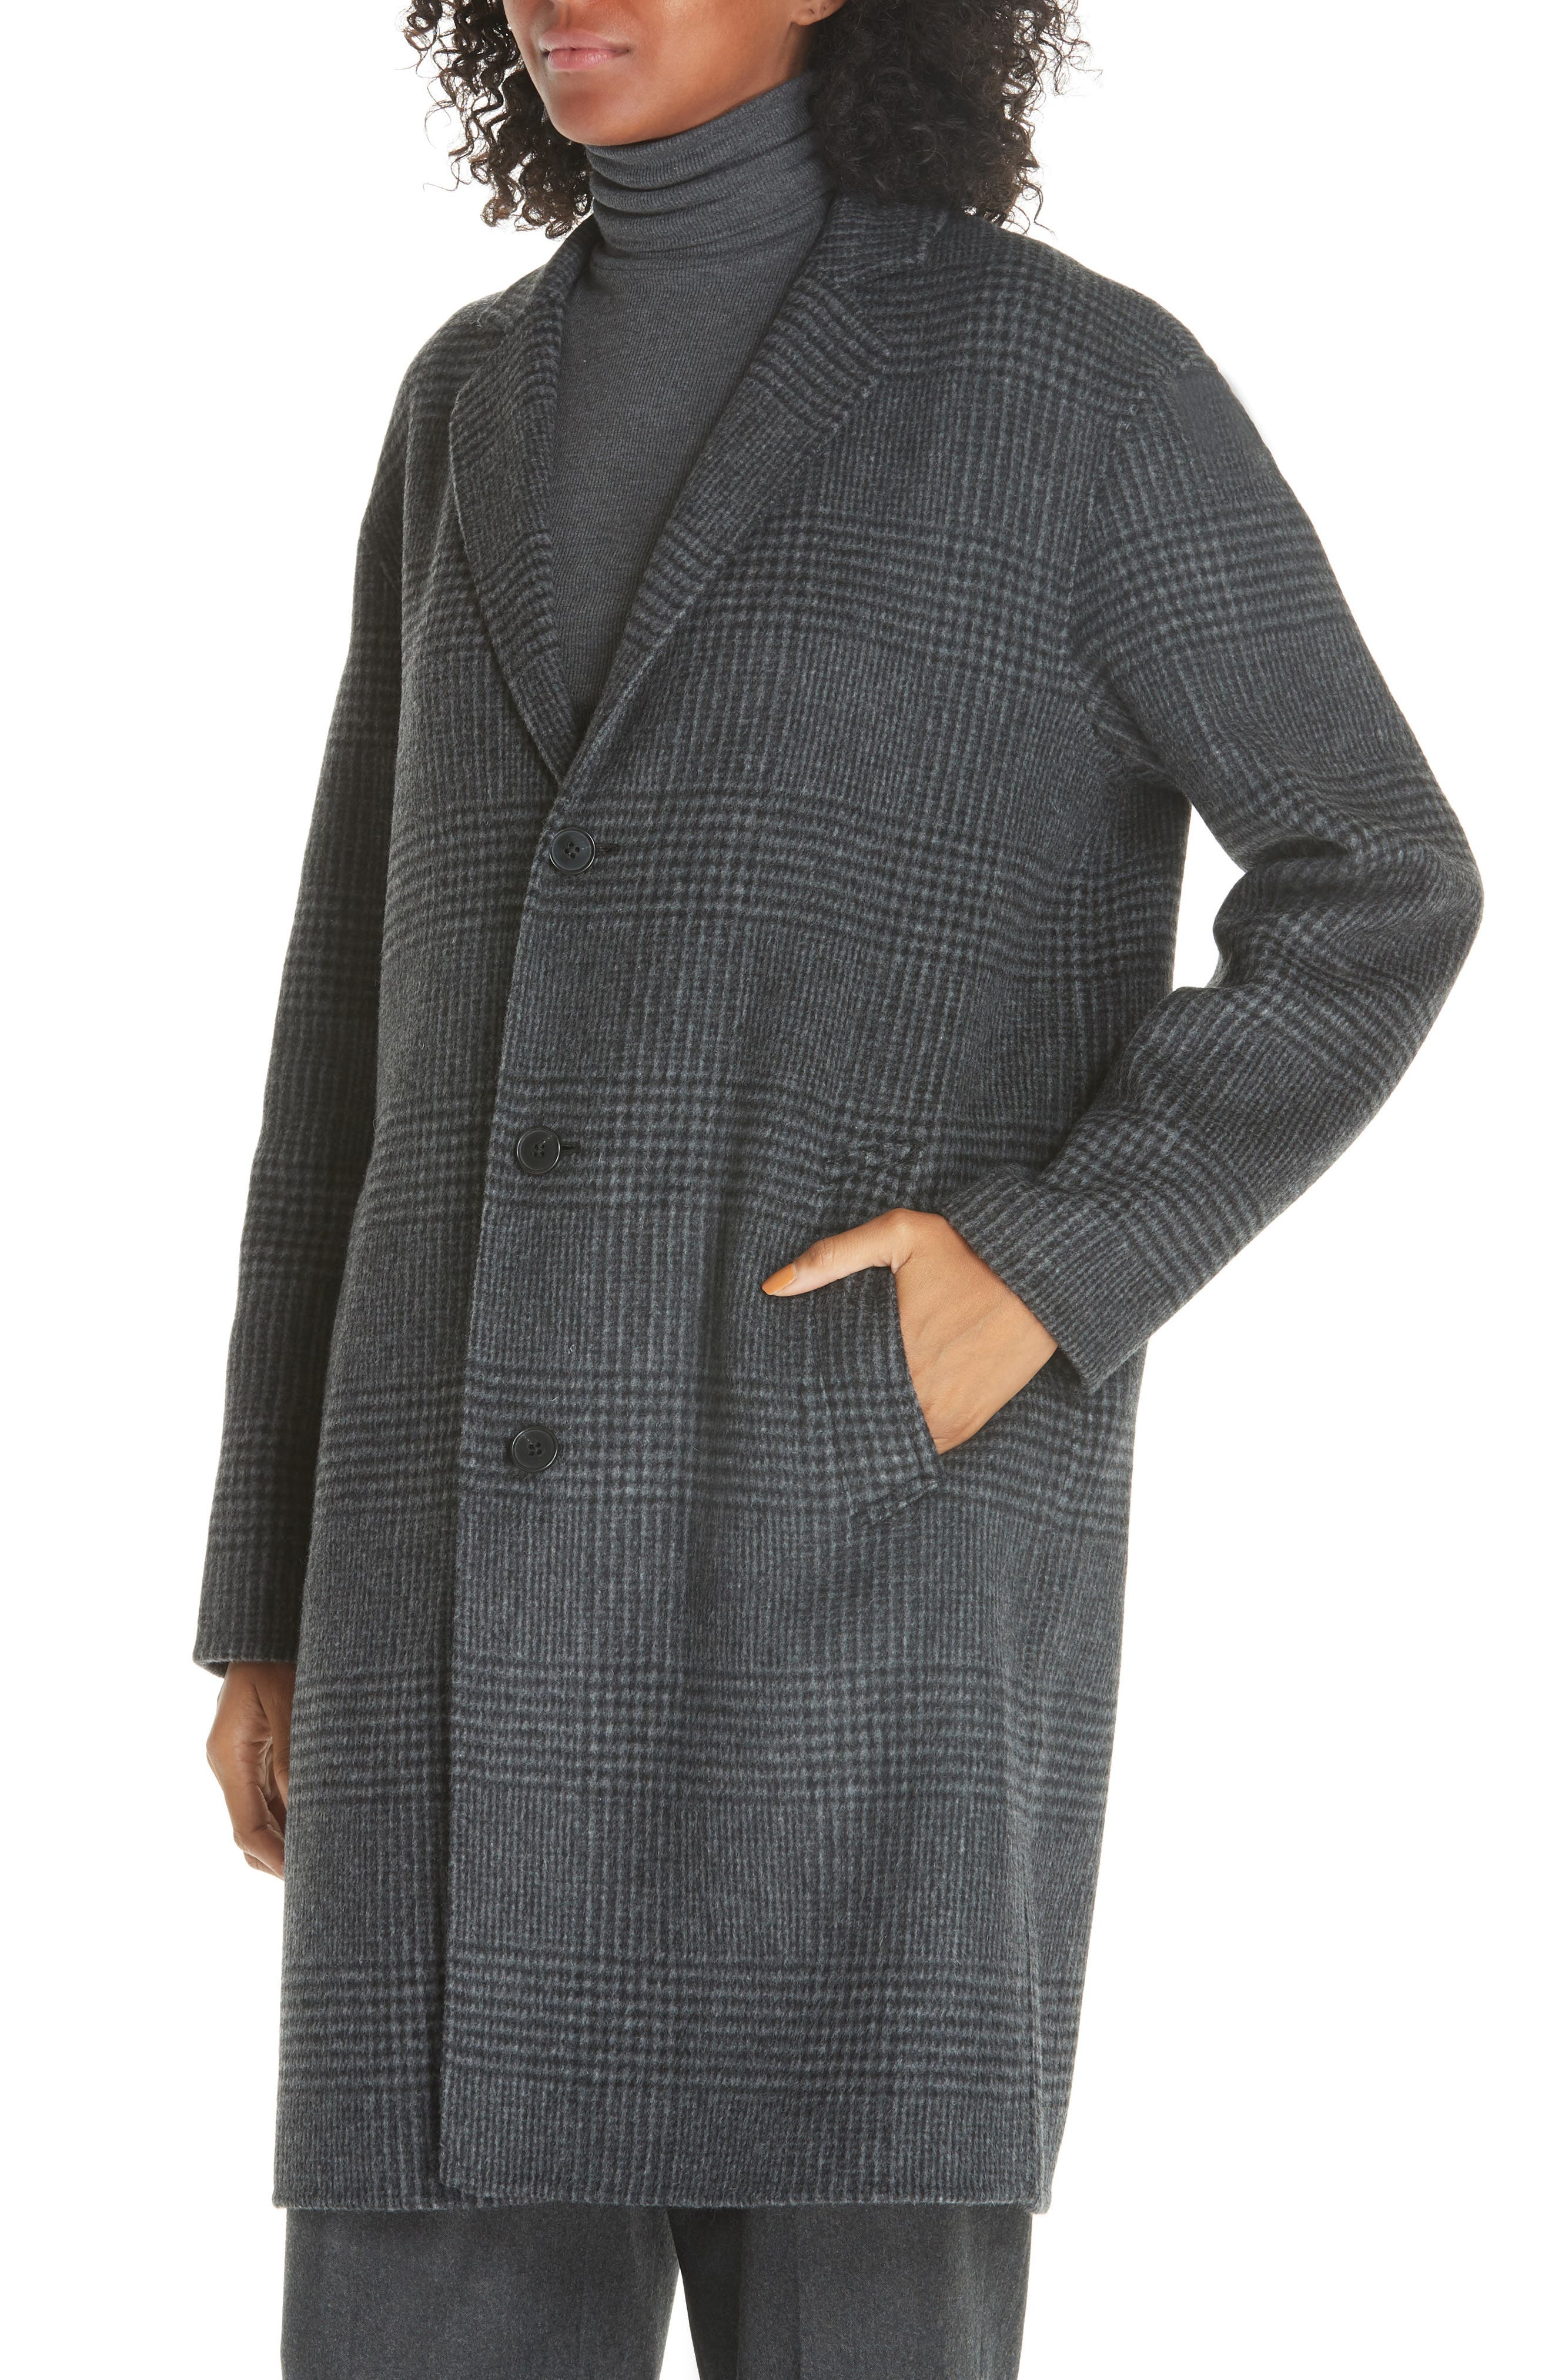 Plaid Wool Blend Coat,                             Alternate thumbnail 4, color,                             CHARCOAL GLEN PLAID